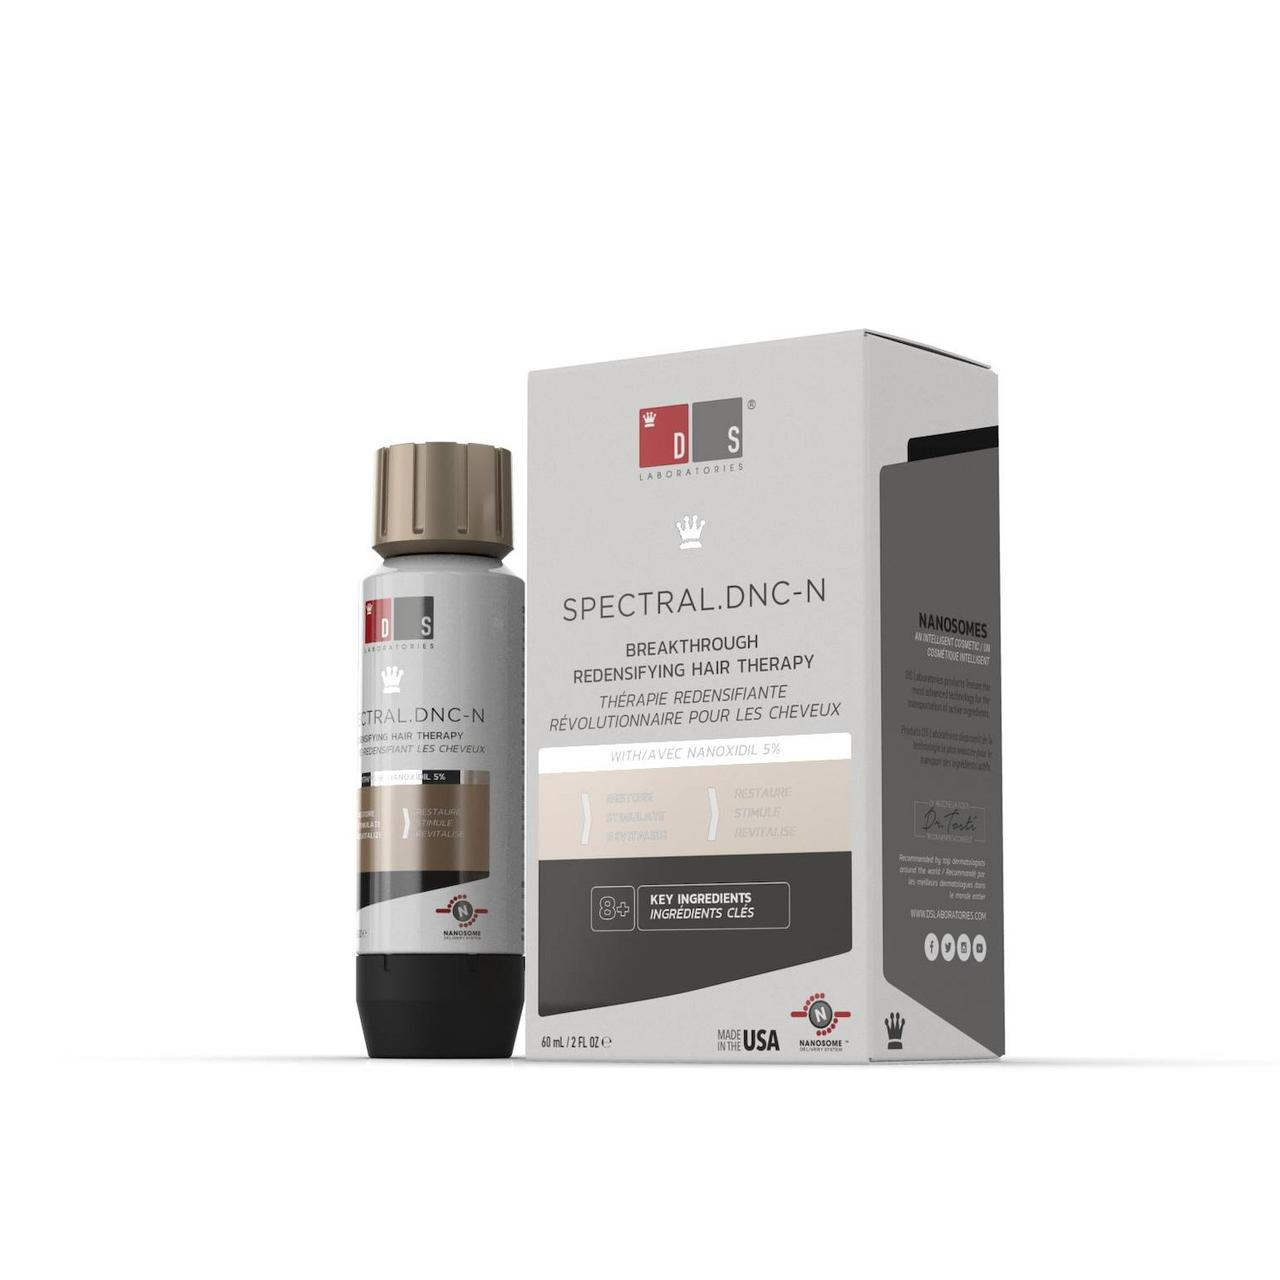 Лосьон для роста волос Наноксидил Spectral DNC-N 5%, DS Laboratories